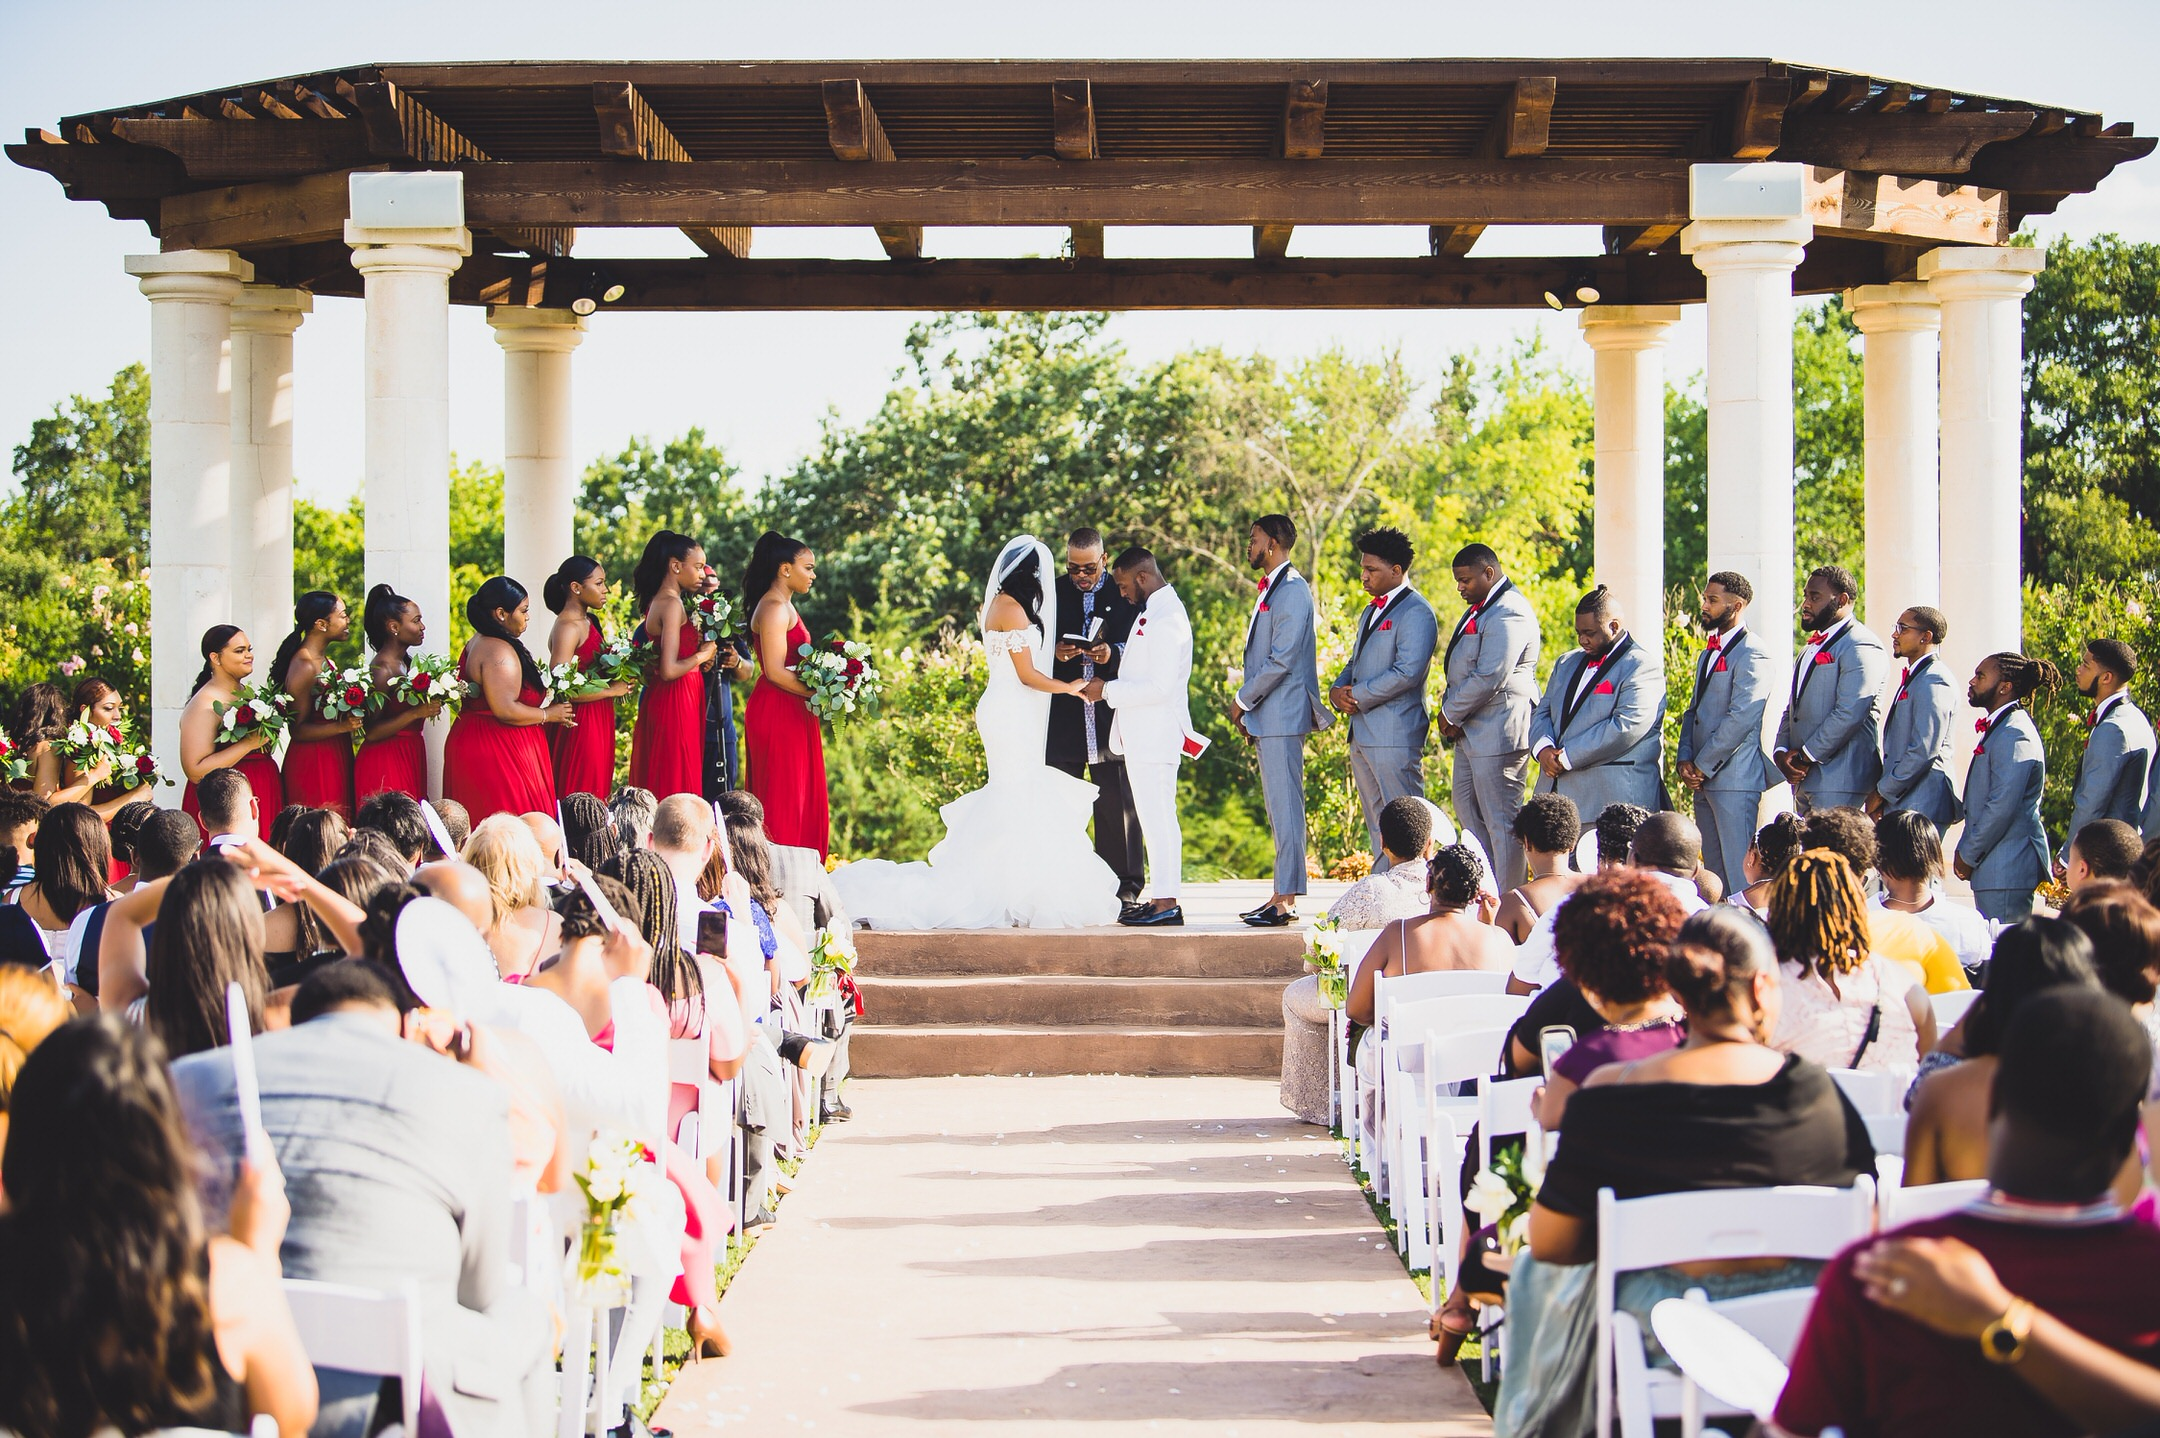 Leon-Contreras-Houston-Texas-Aggie-Wedding-Graduation-Engagement-Portrait-Photographer-4285.jpg